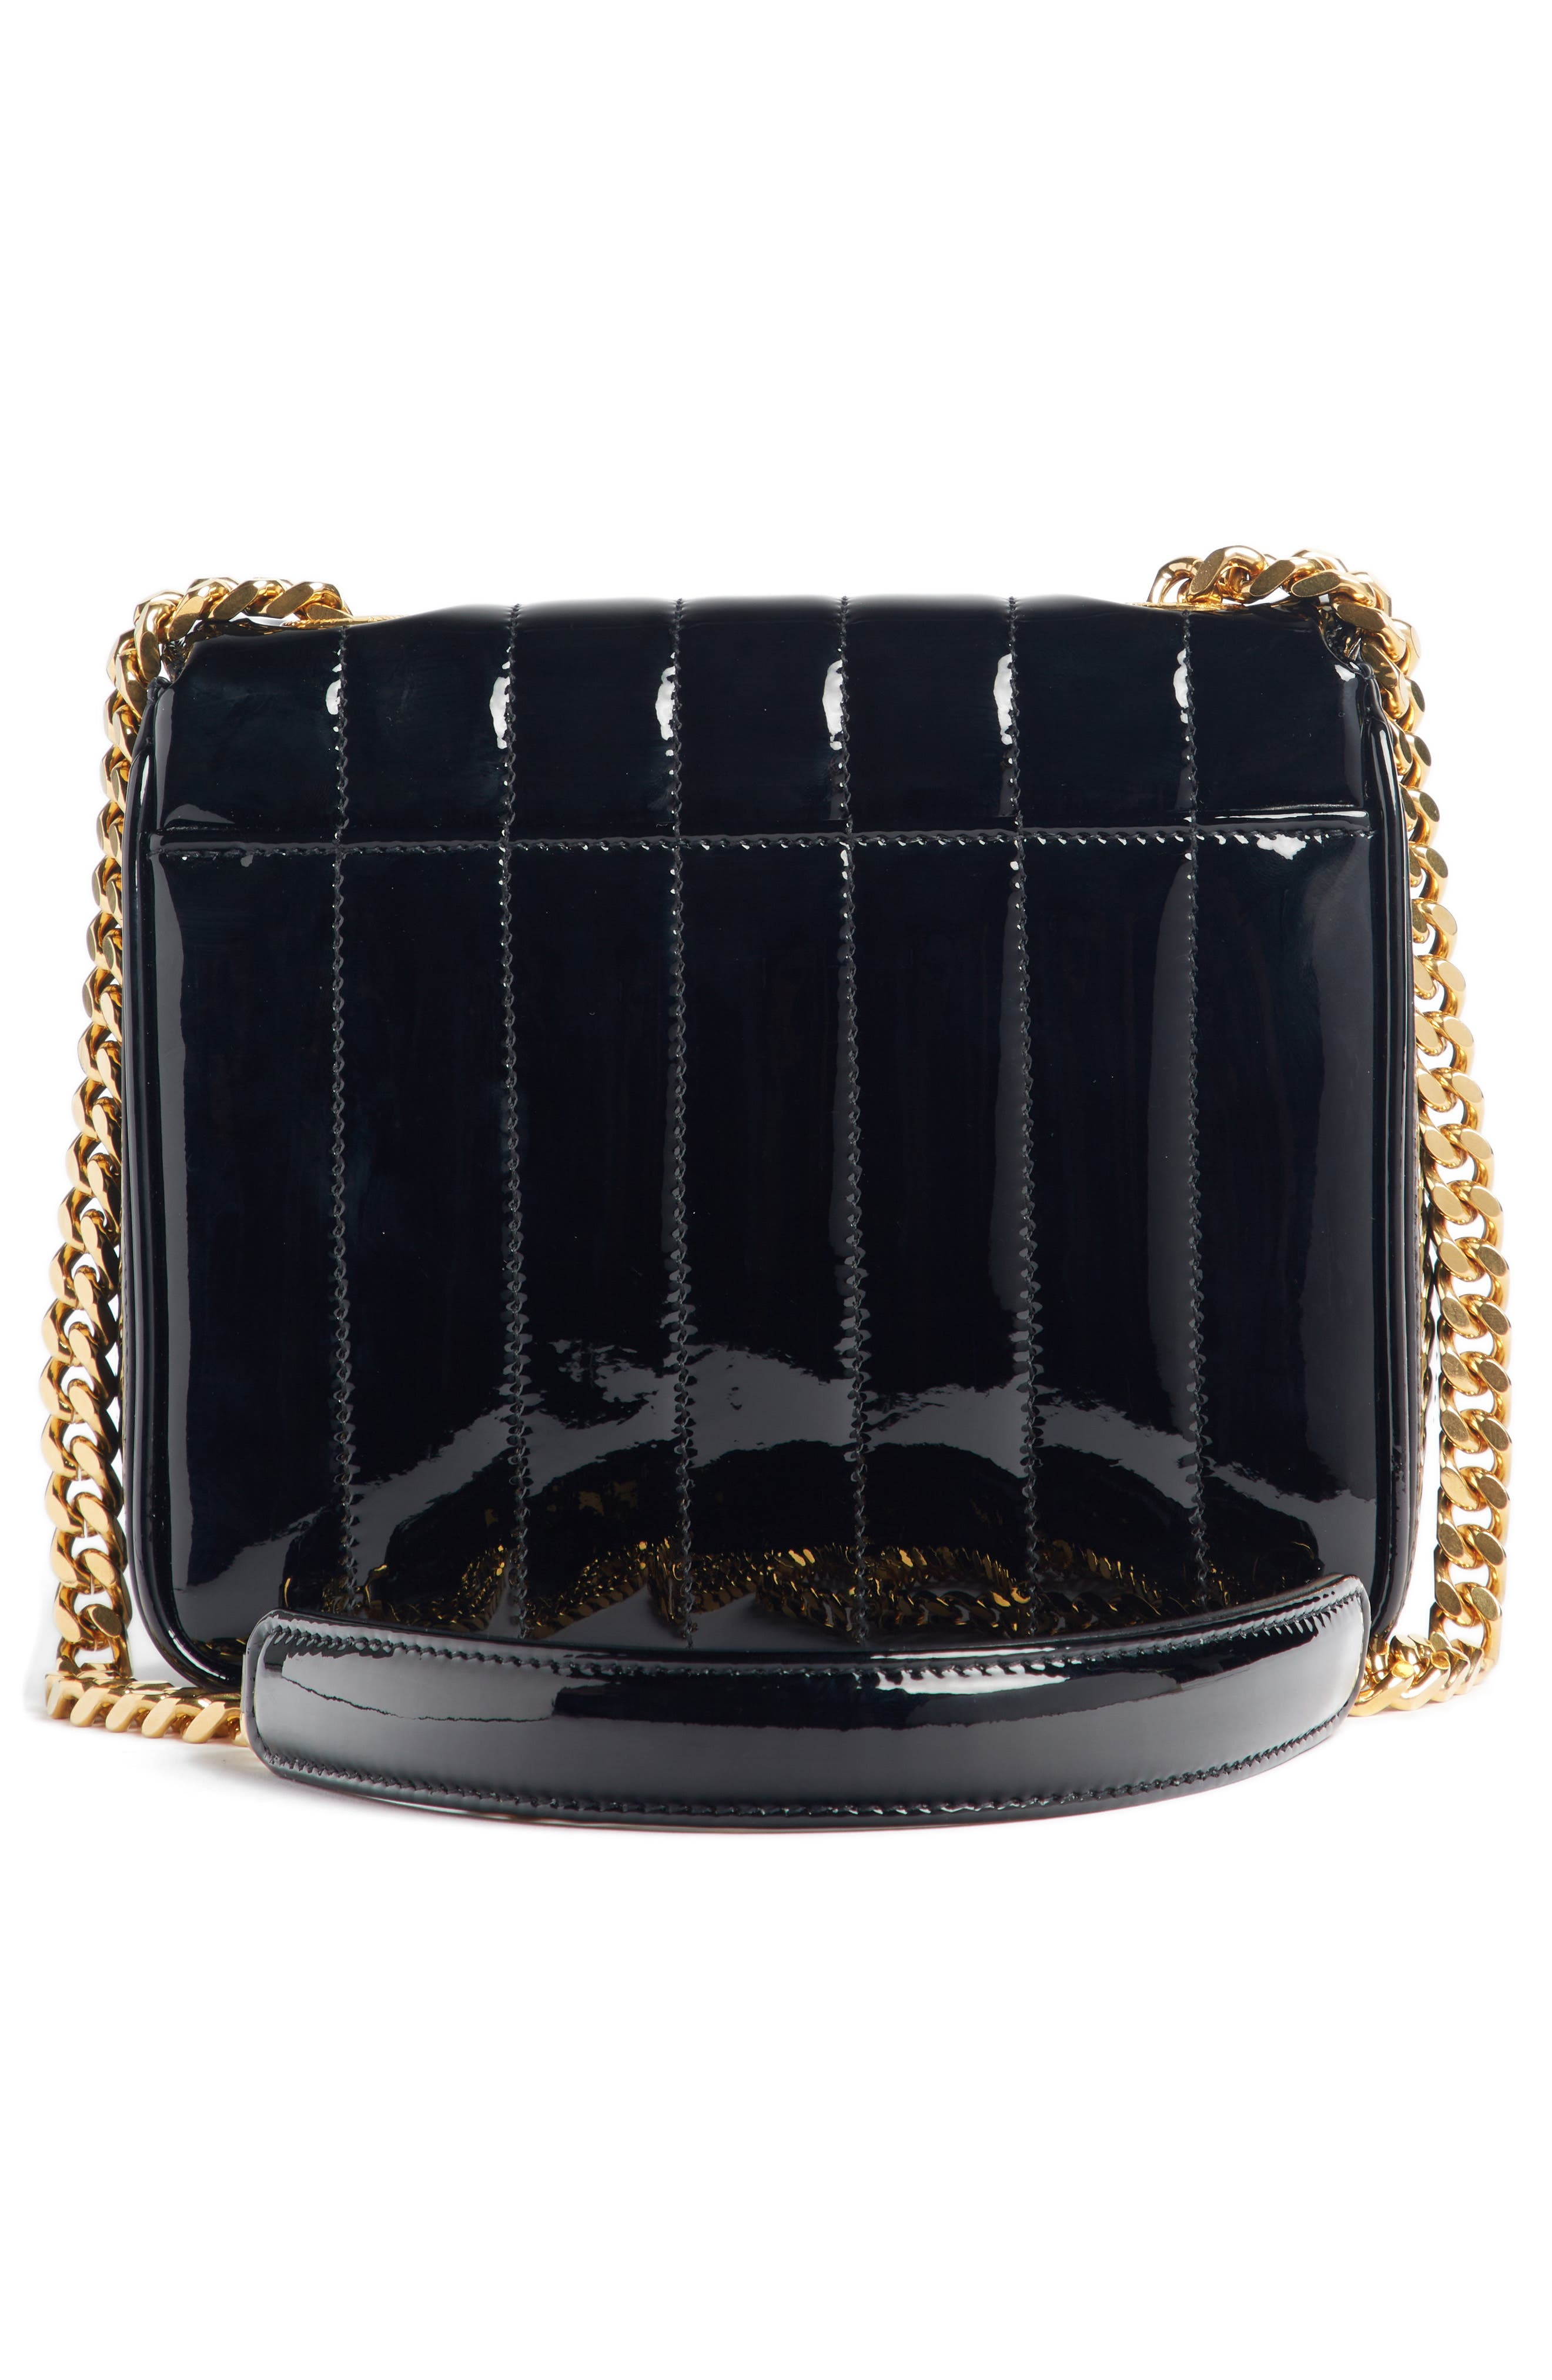 SAINT LAURENT, Small Vicky Patent Leather Crossbody Bag, Alternate thumbnail 2, color, NOIR